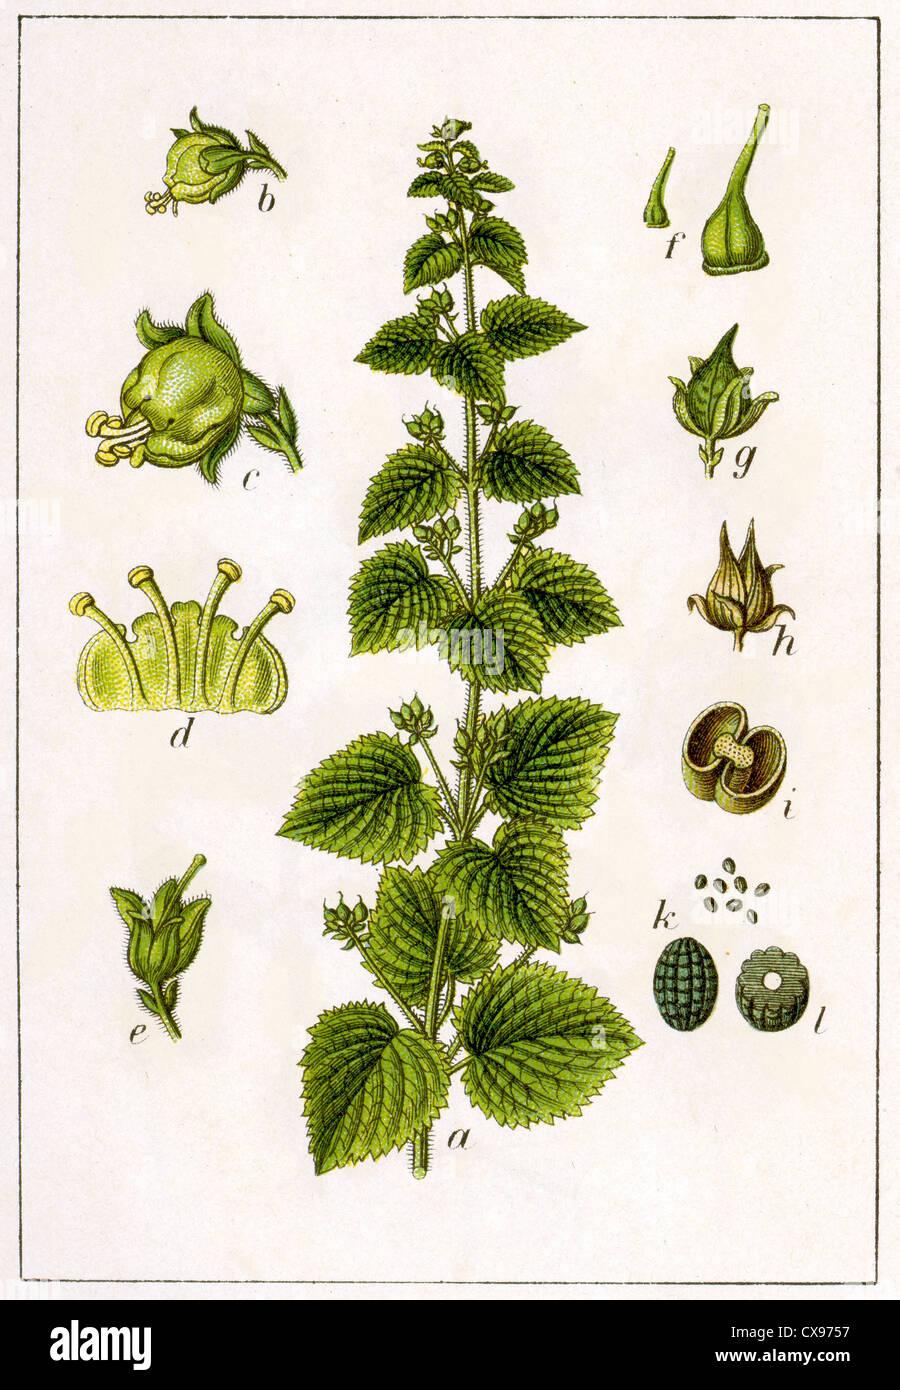 Scrofularia vernalis - Stock Image